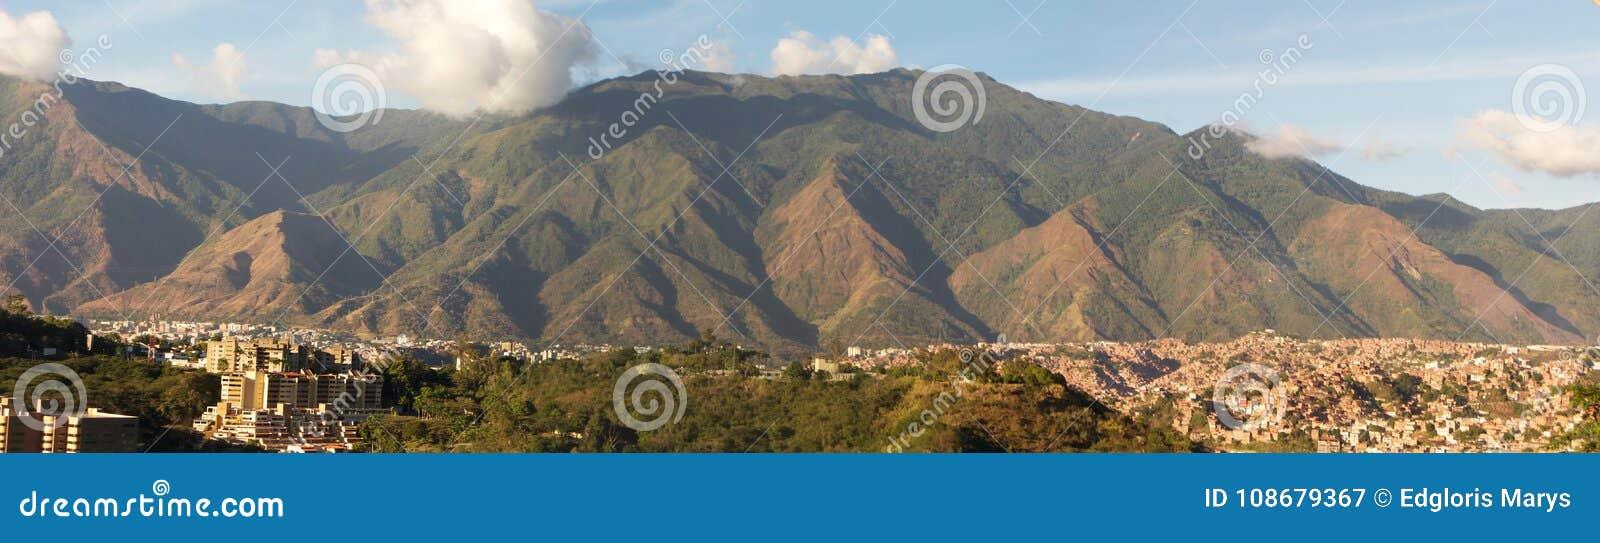 Vista panoramica del parco nazionale di EL Avila di Cerro, montagna famosa a Caracas Venezuela